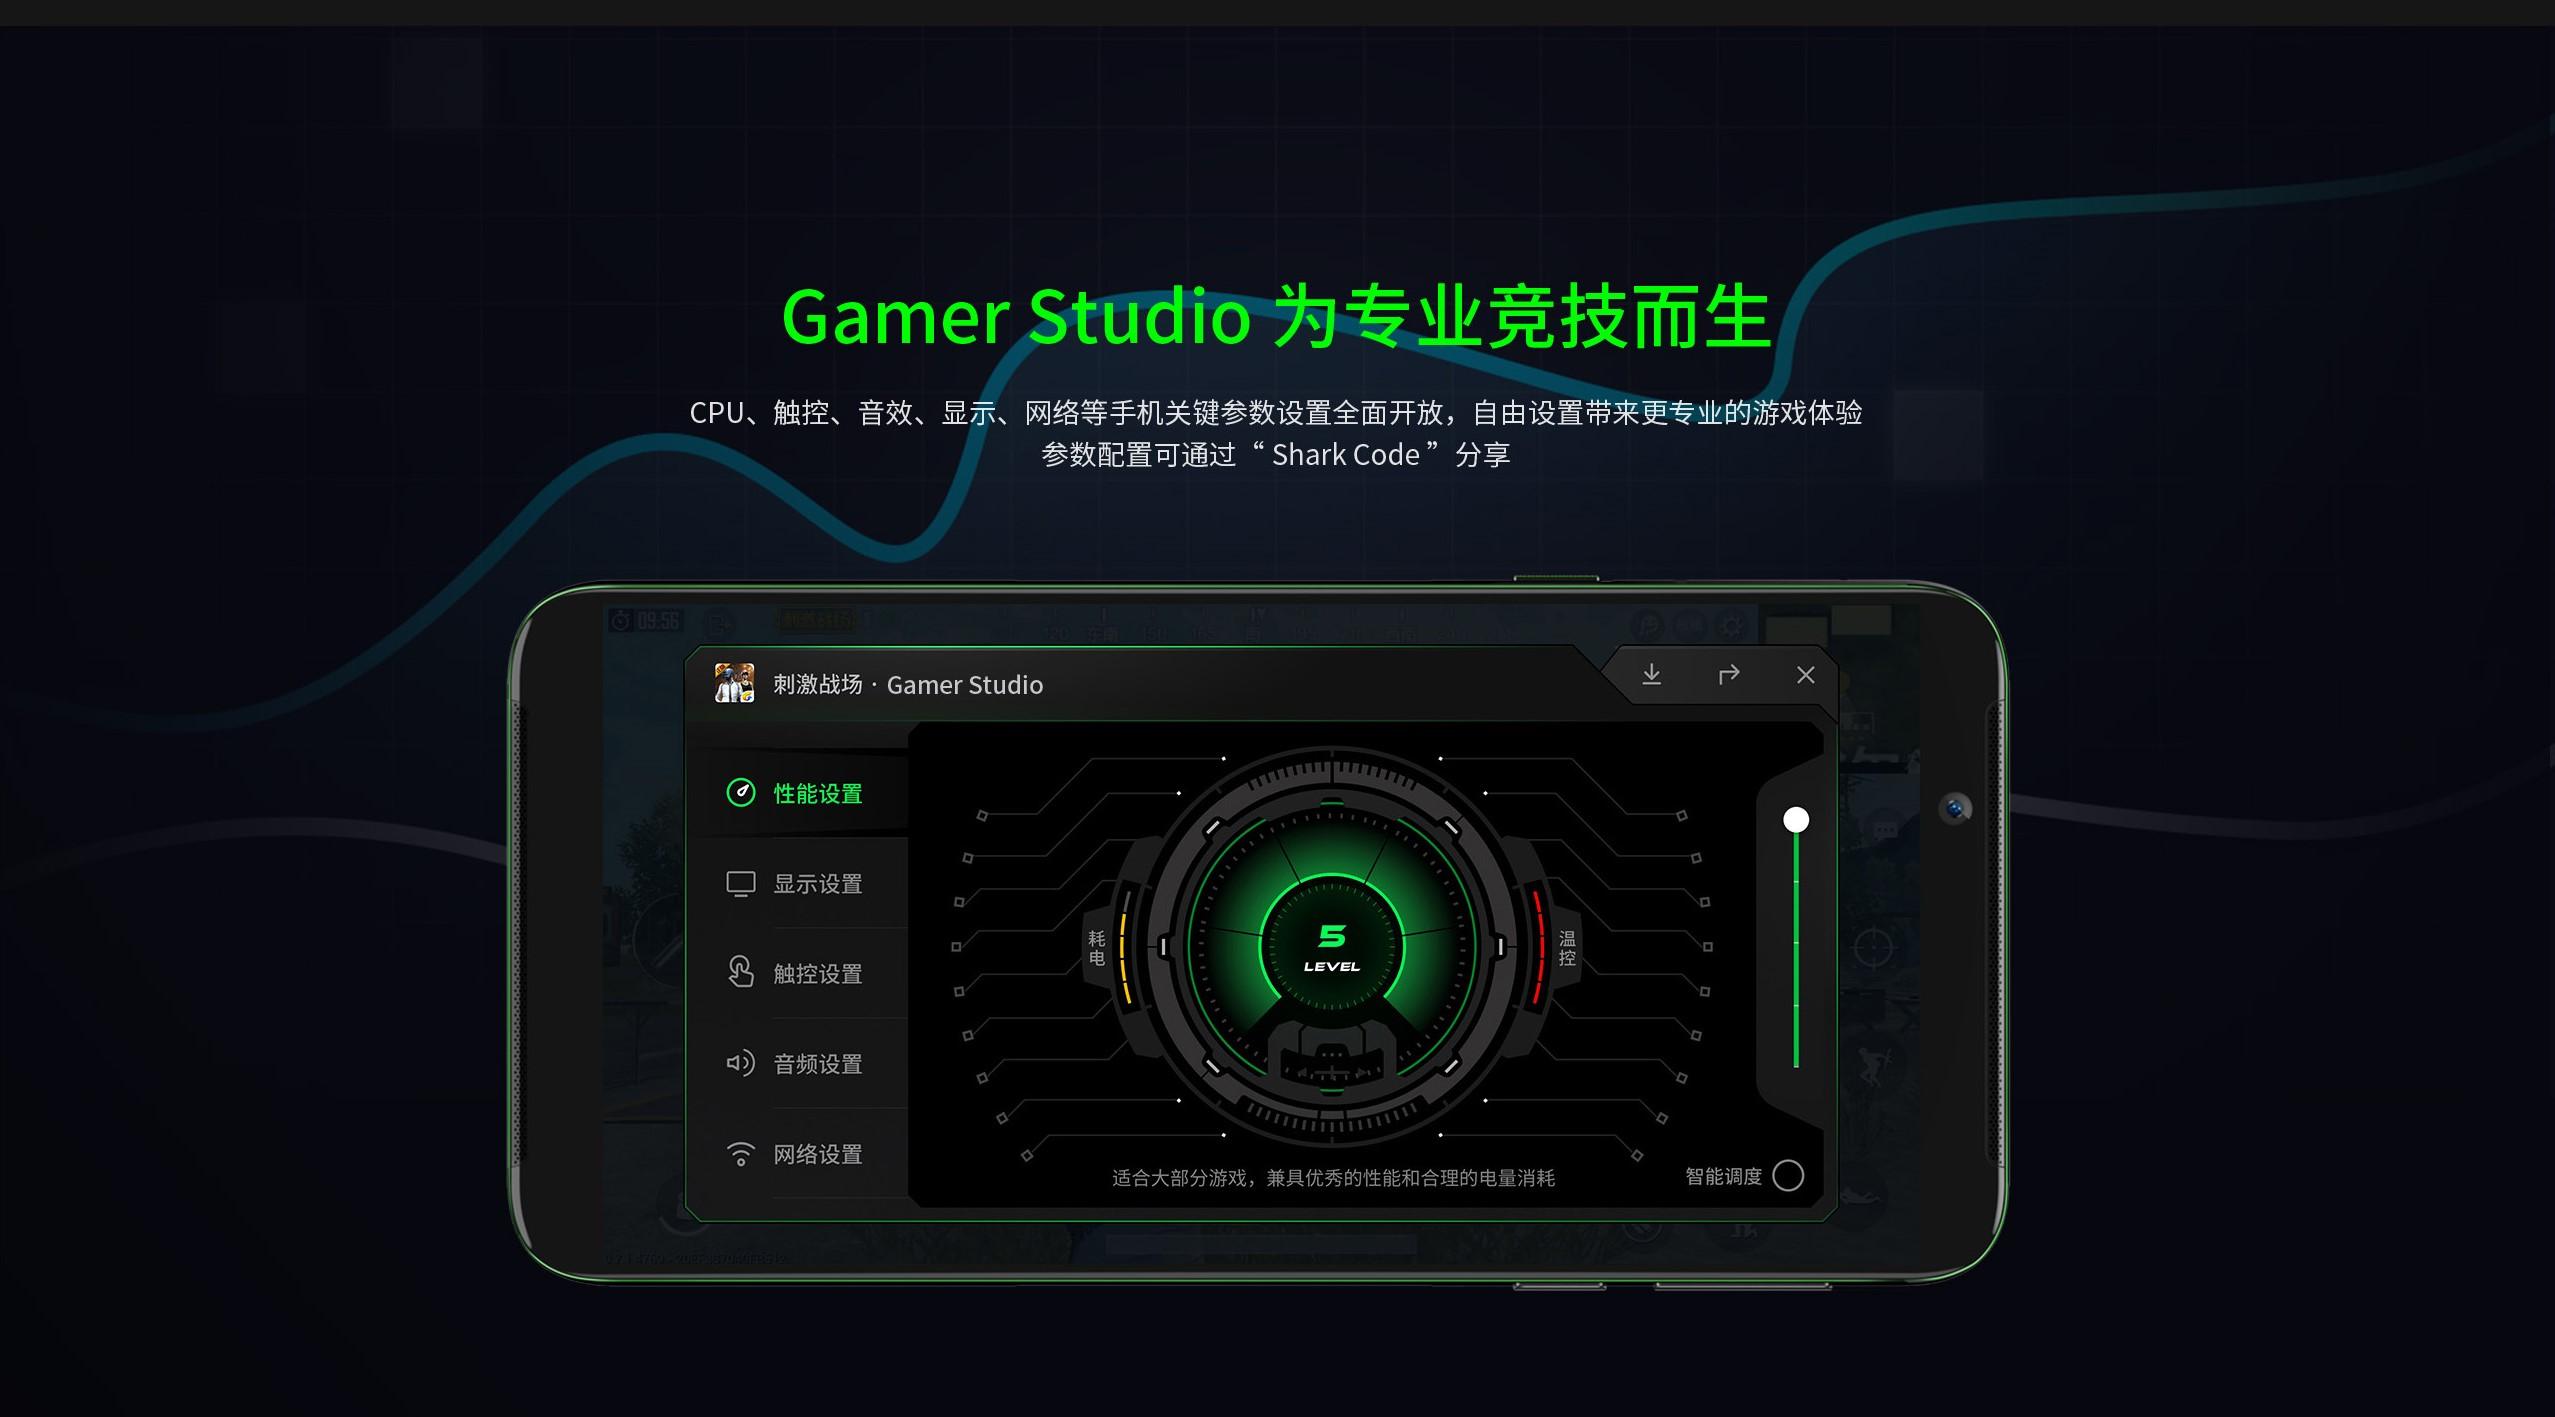 gamer studio 截图.jpg